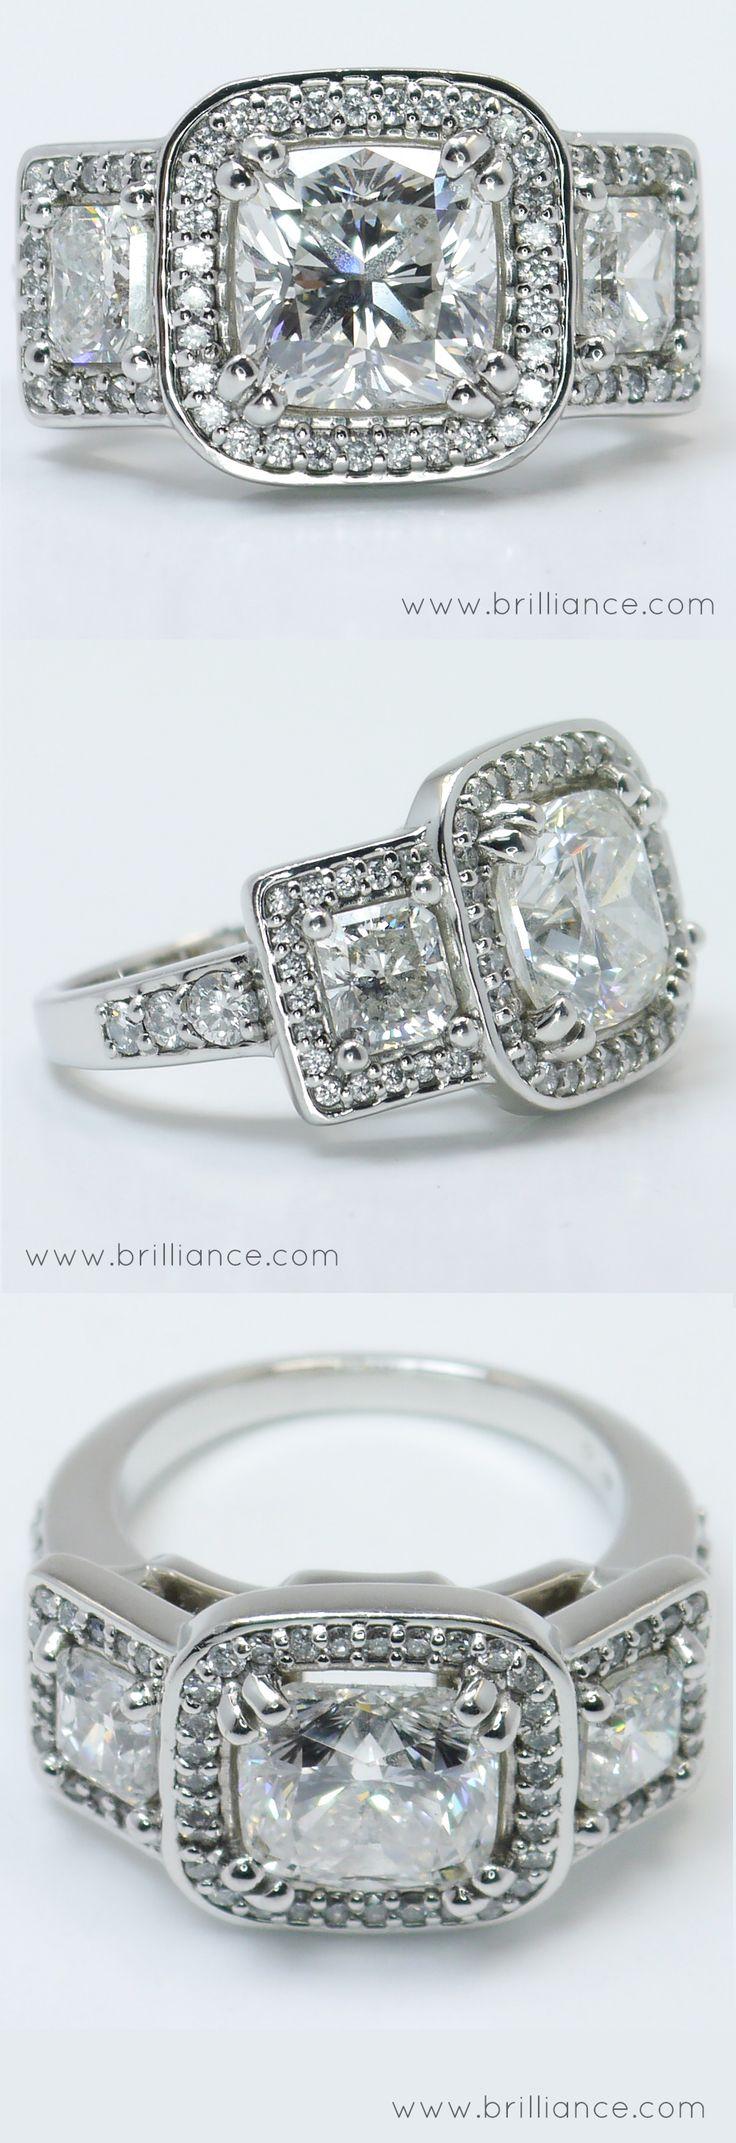 Brilliance's Custom Halo Ring With Cushion Cut Center Stone The  Cushion Diamonds Offer